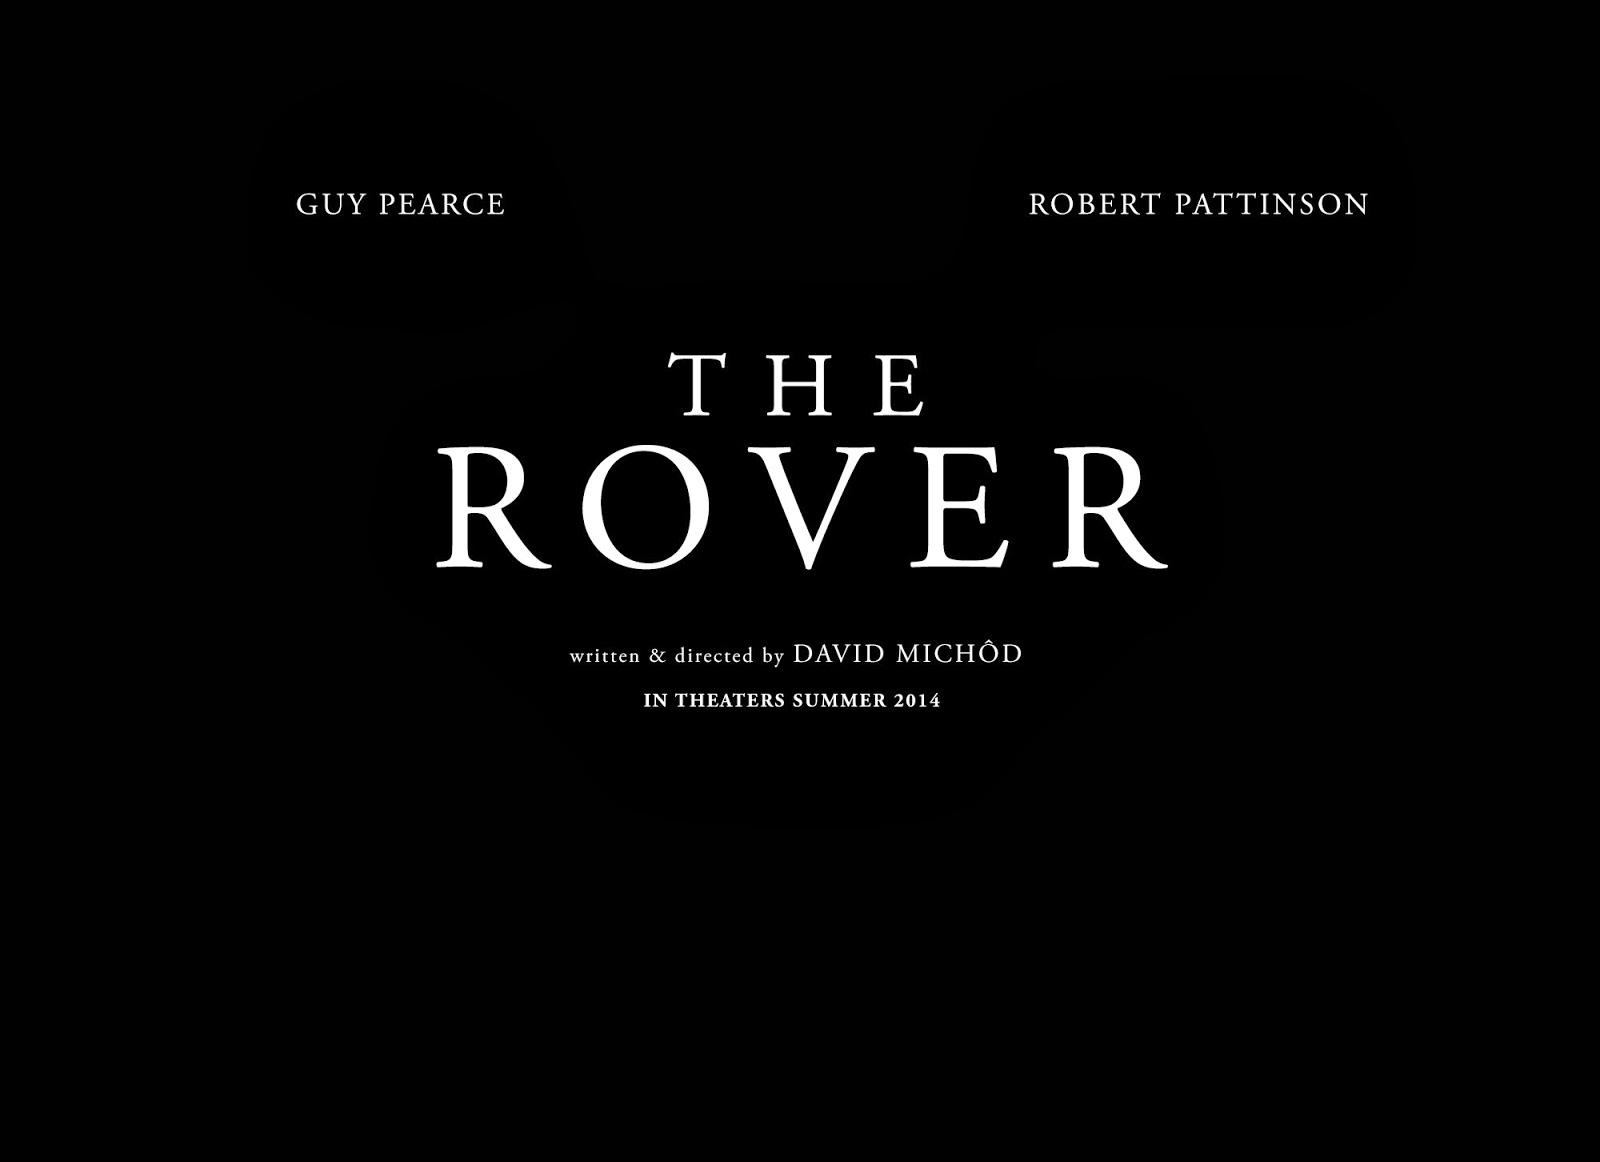 http://therover-movie.com/